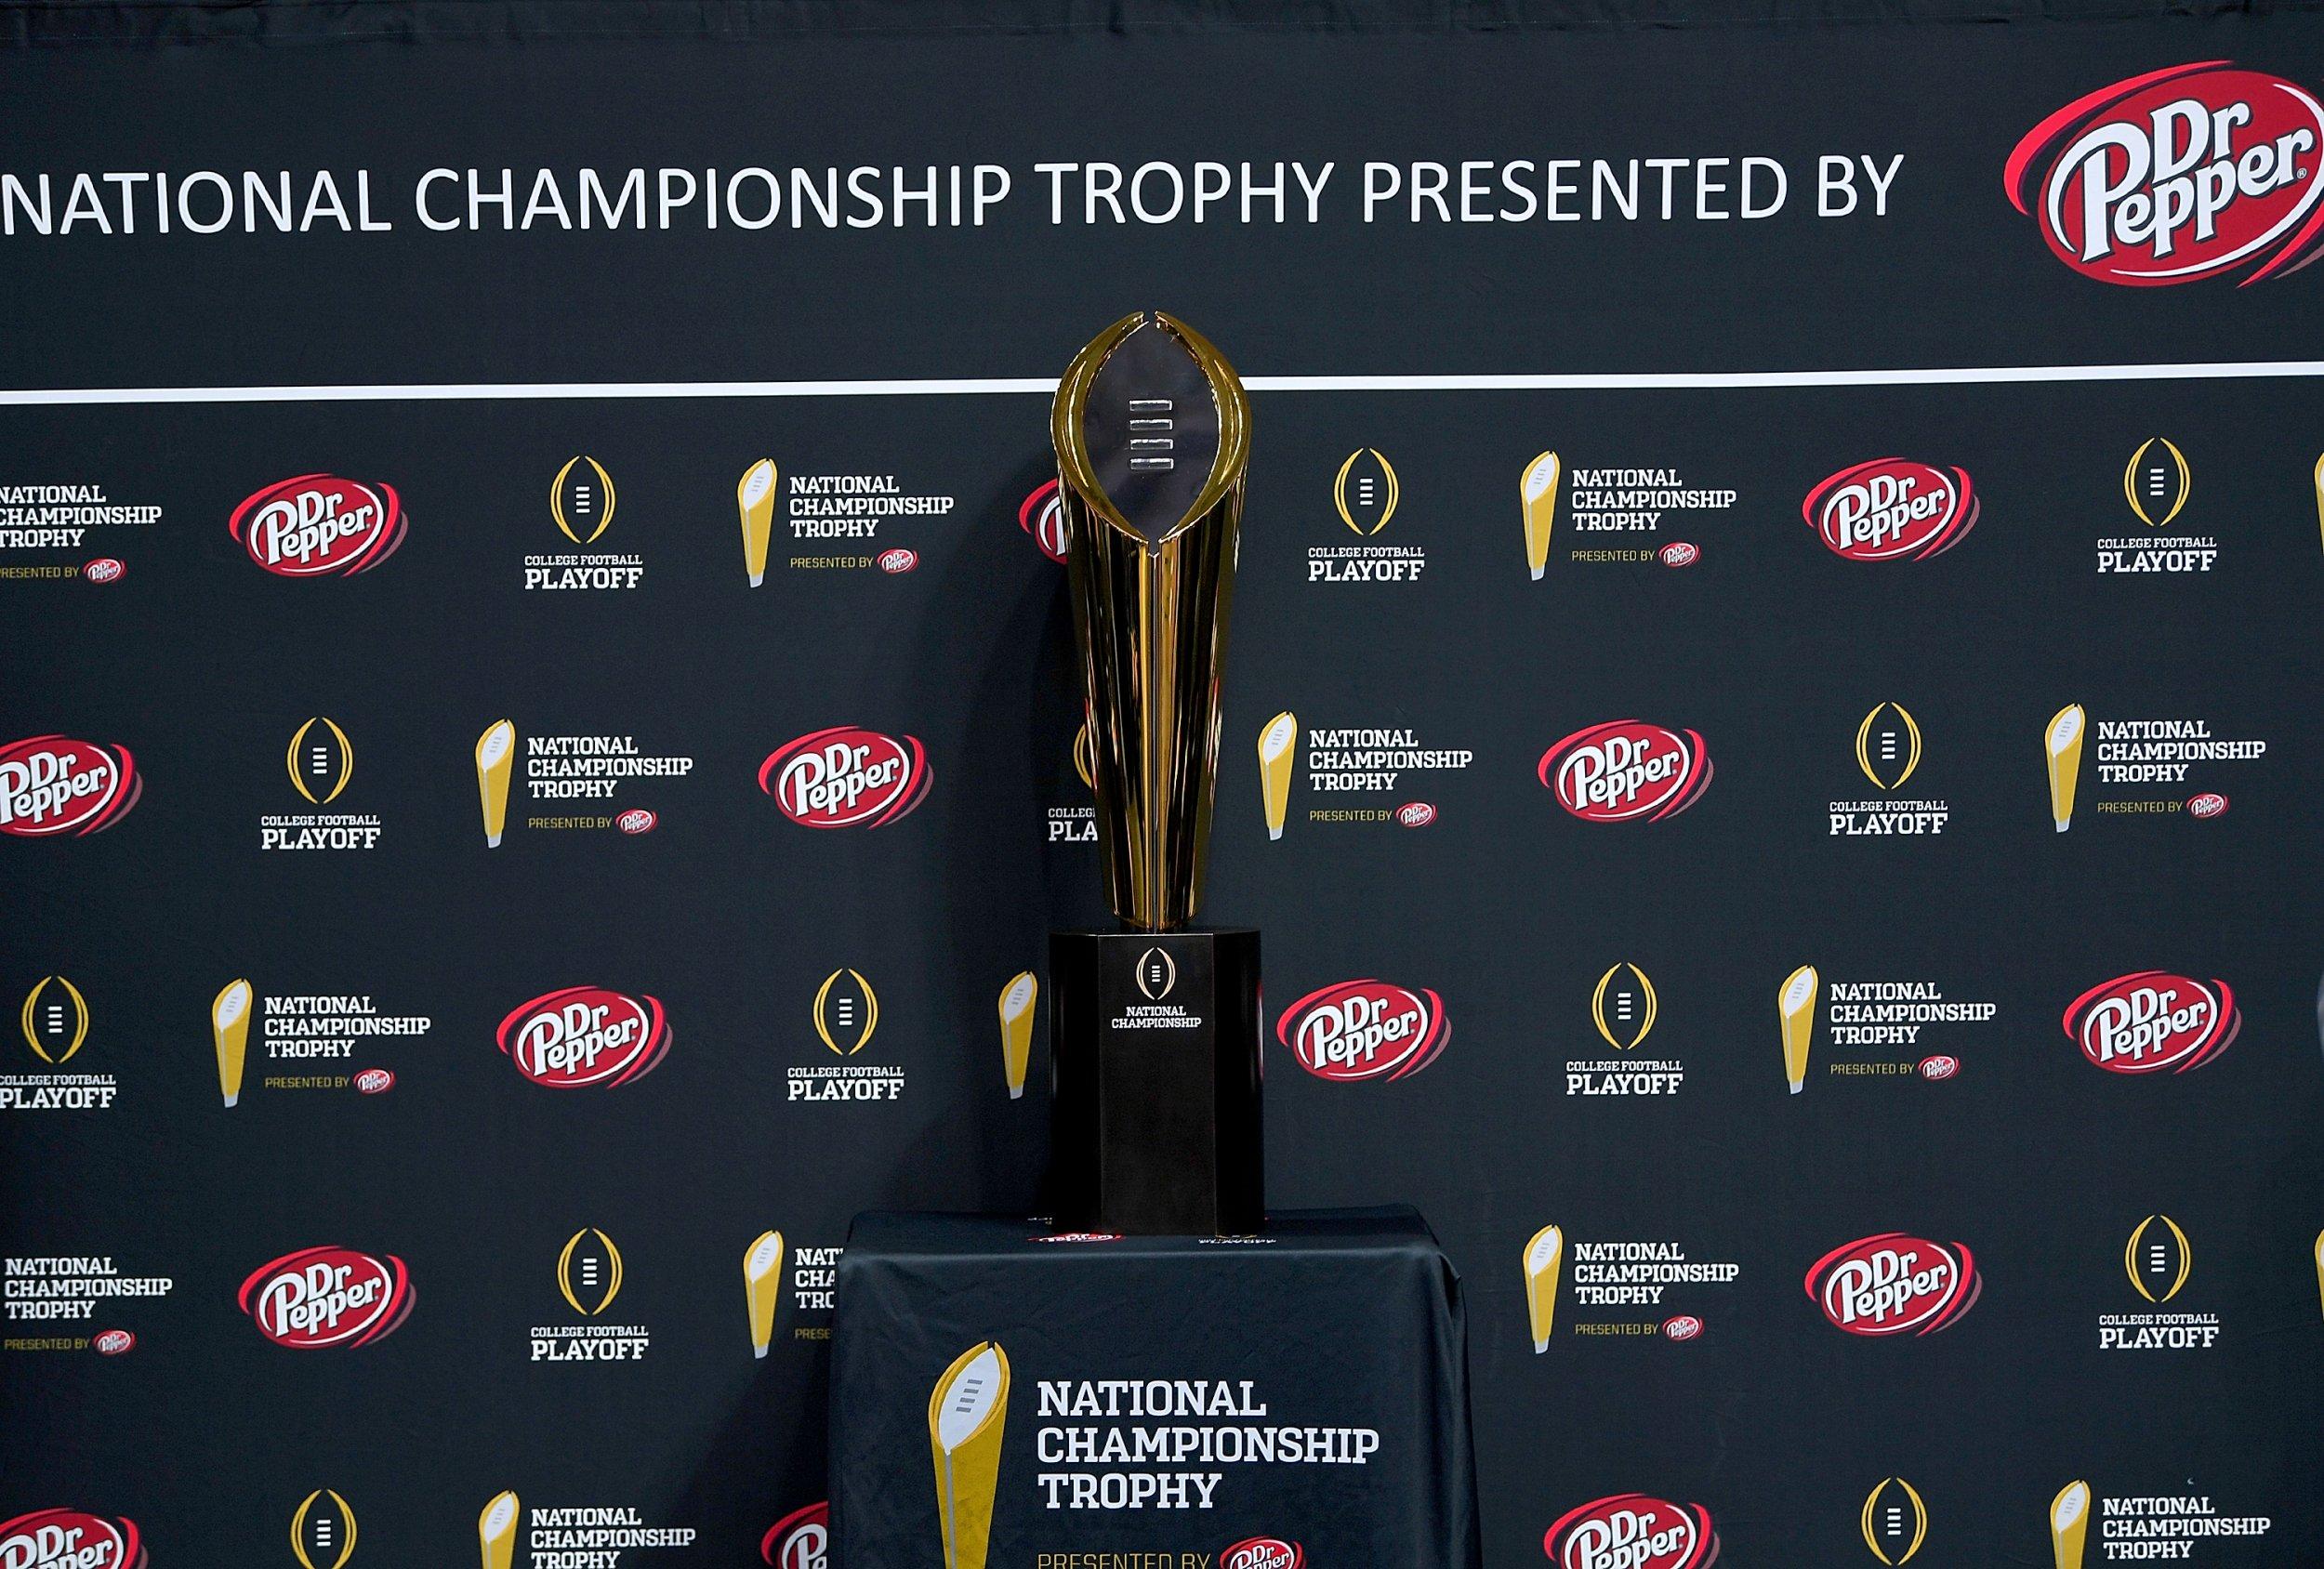 National Championship Trophy